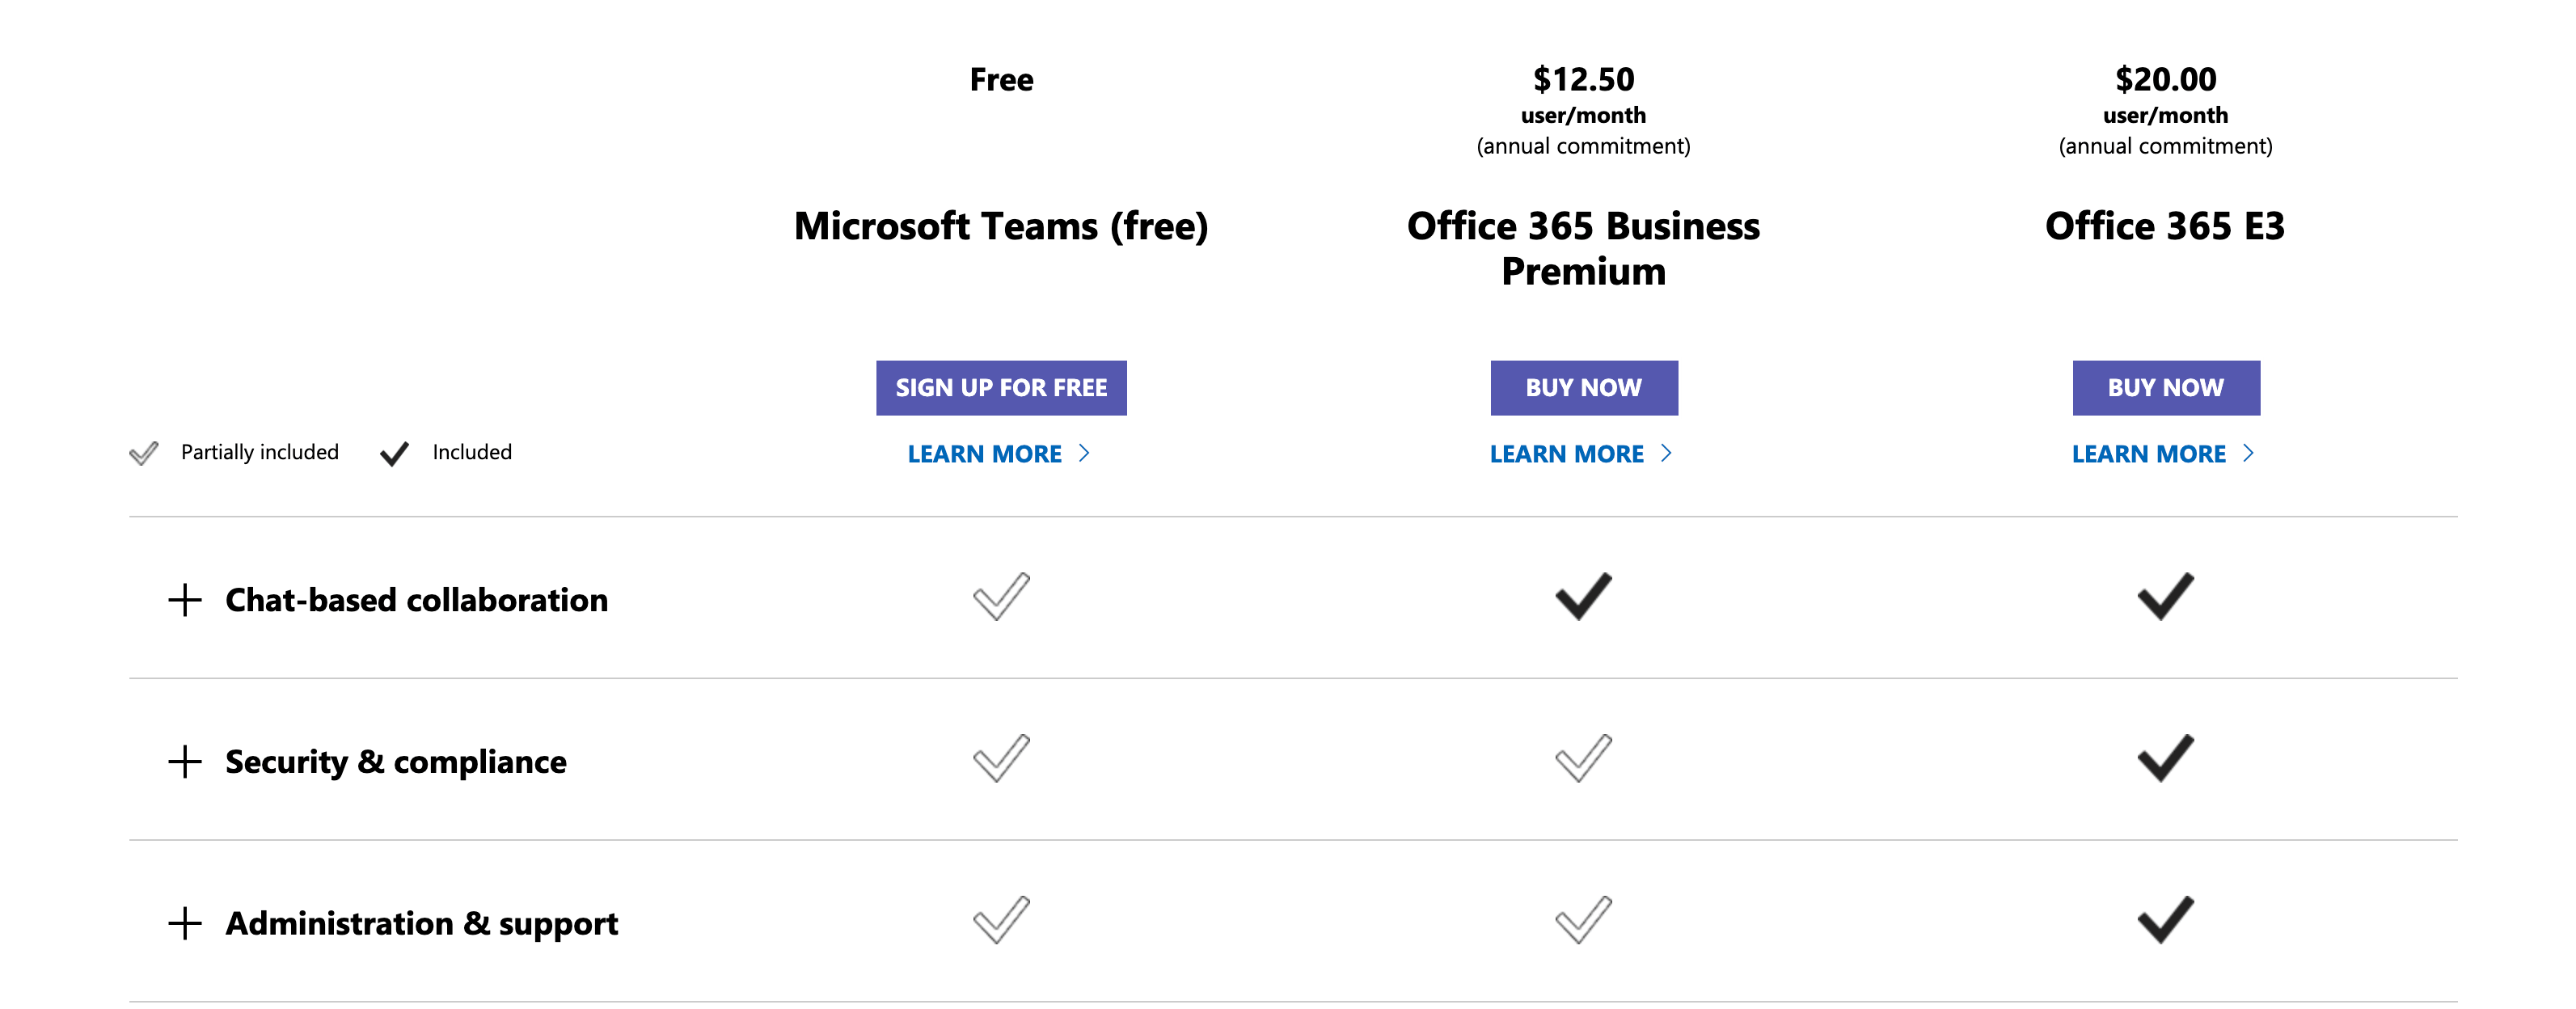 Microsoft Teams company communication tool pricing